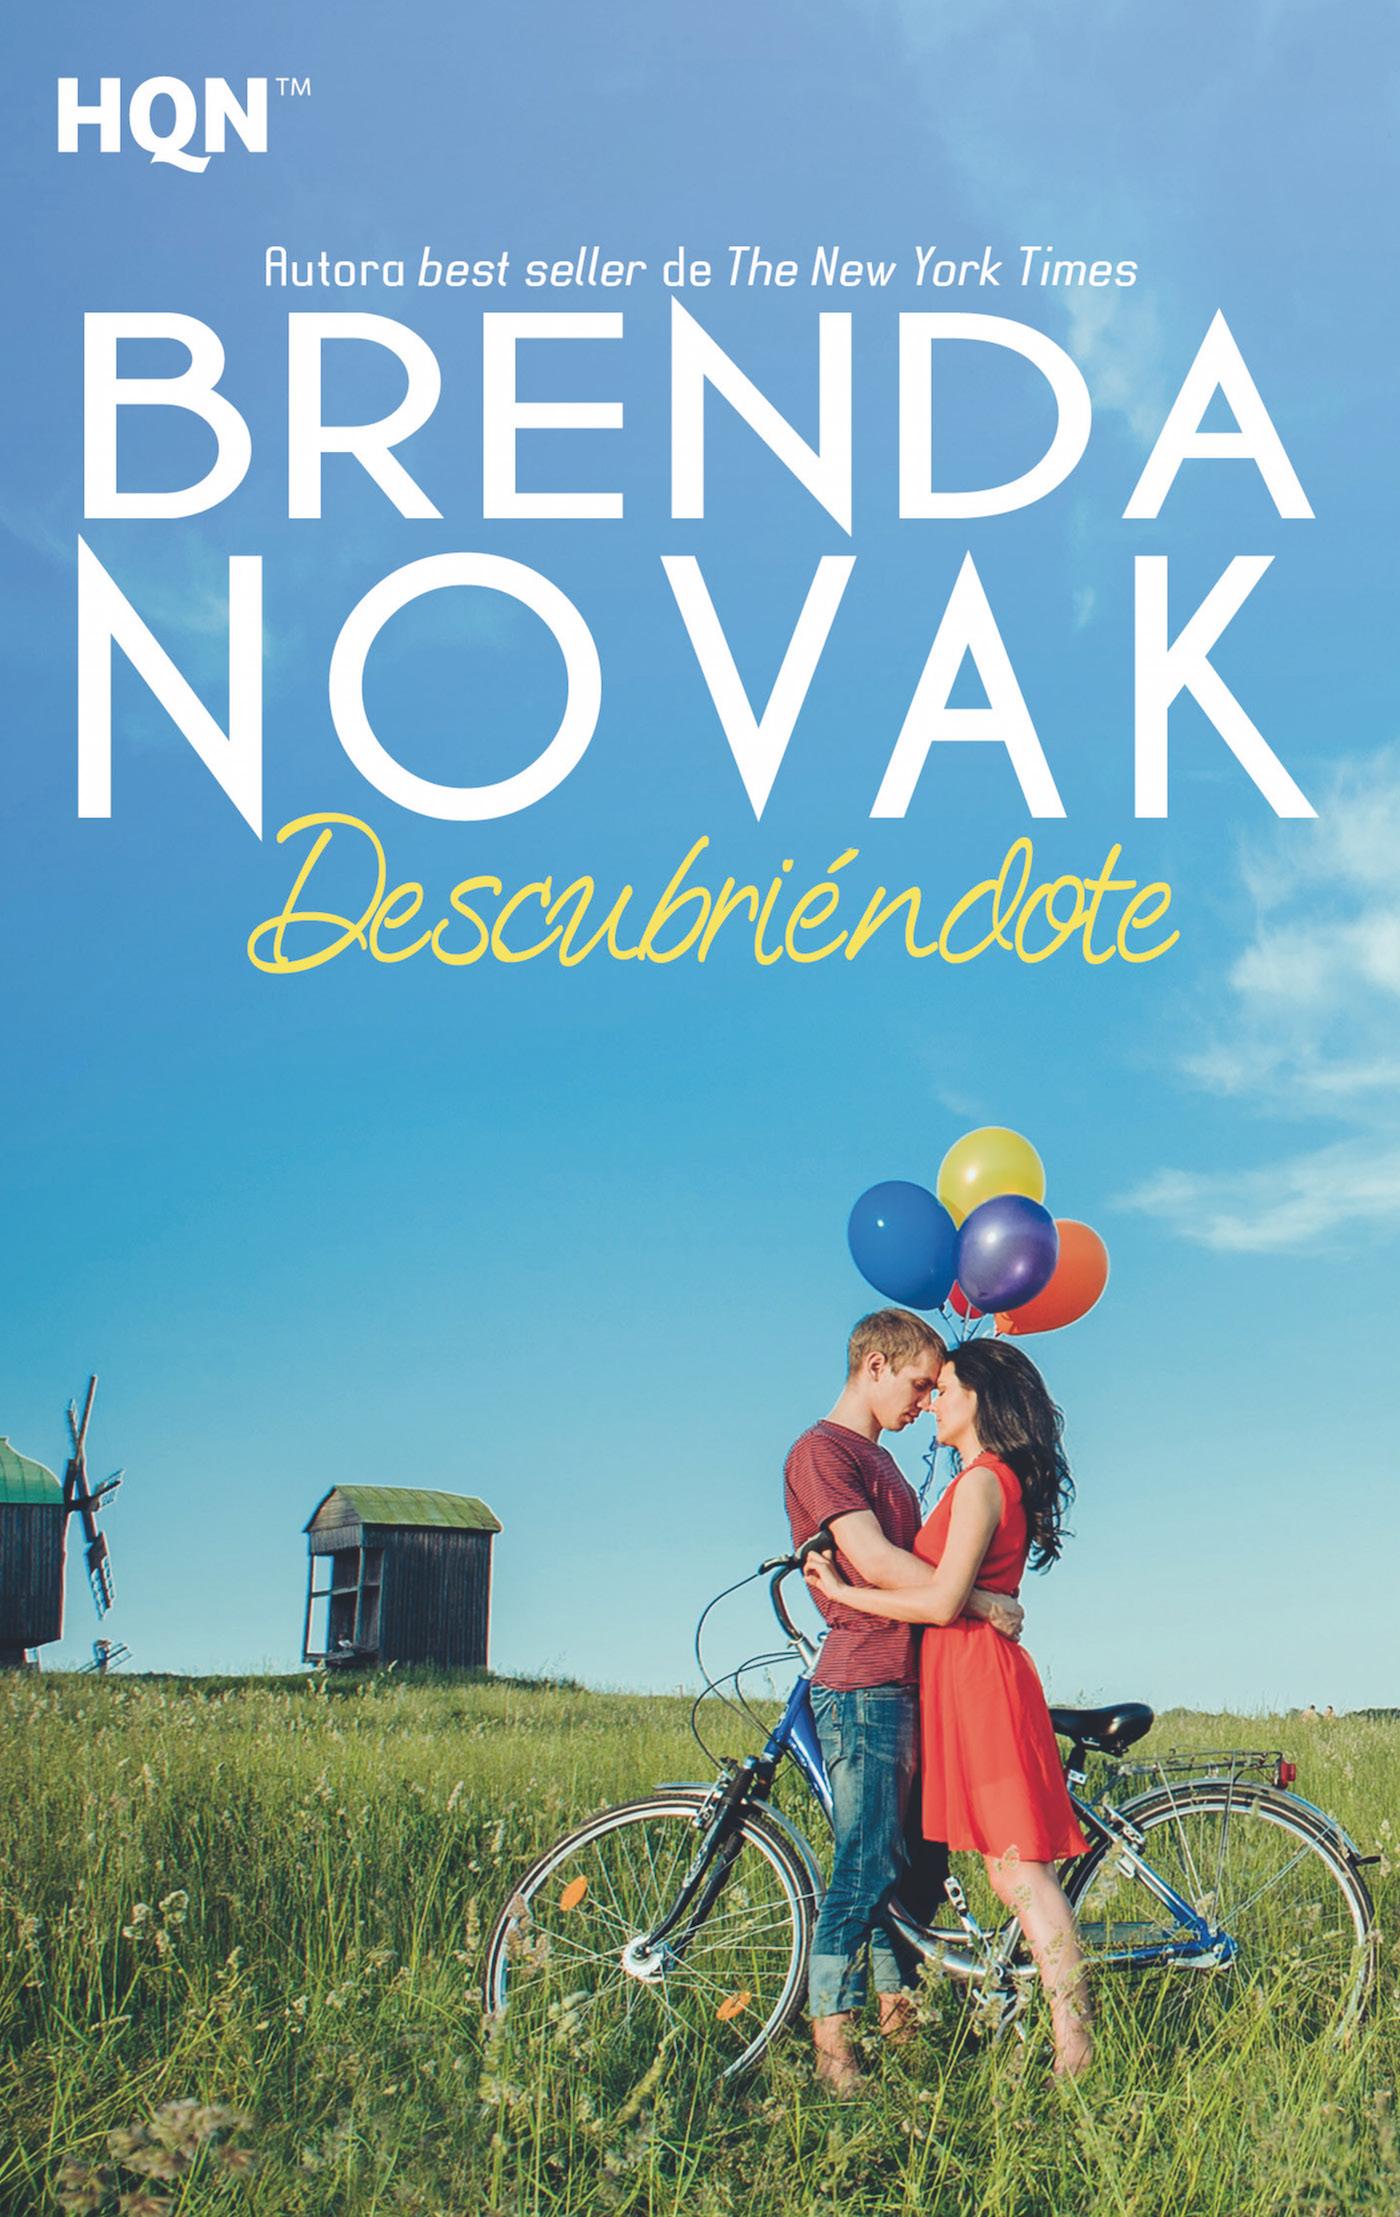 Descubriendote Brenda Novak